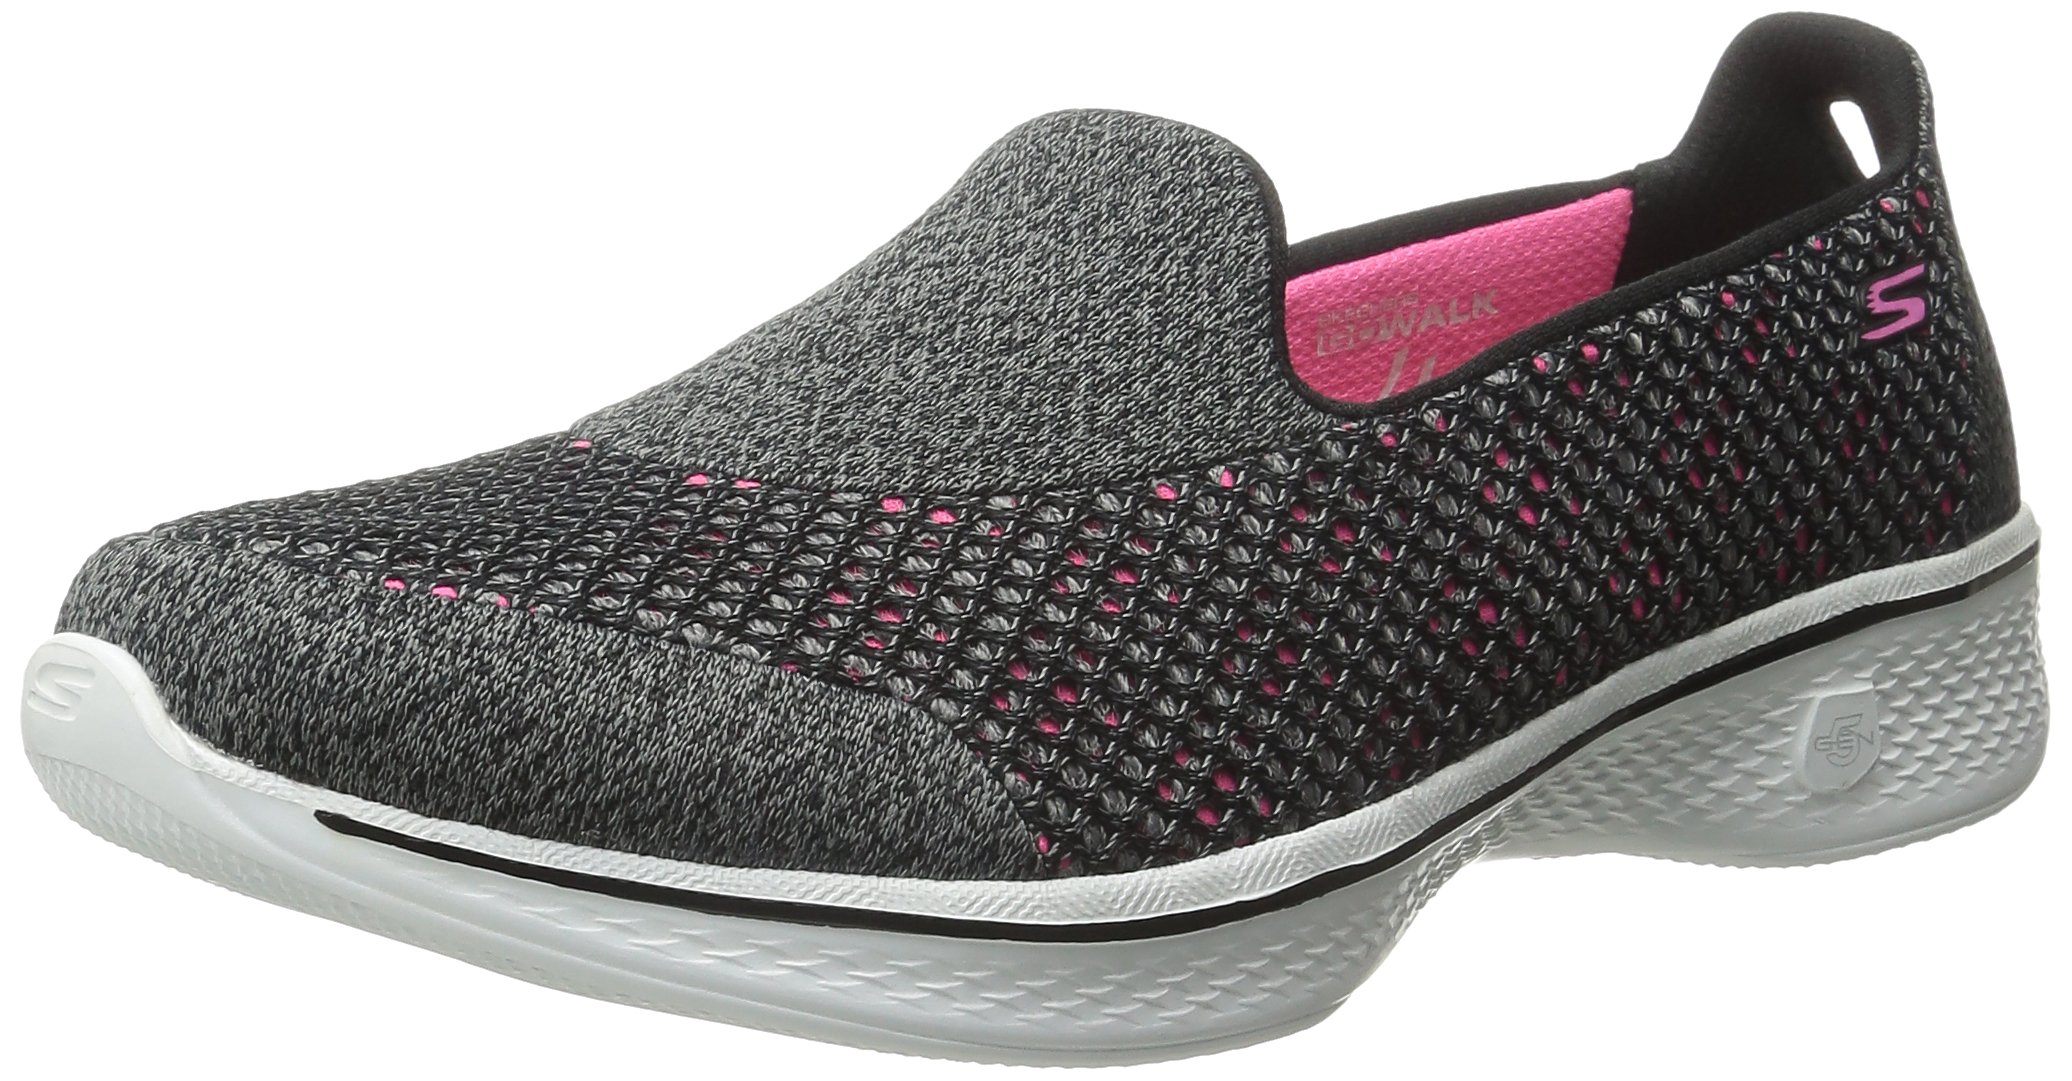 Skechers Performance Women's Go Walk 4 Kindle Slip-On Walking Shoe,Black/Hot Pink,5.5 M US